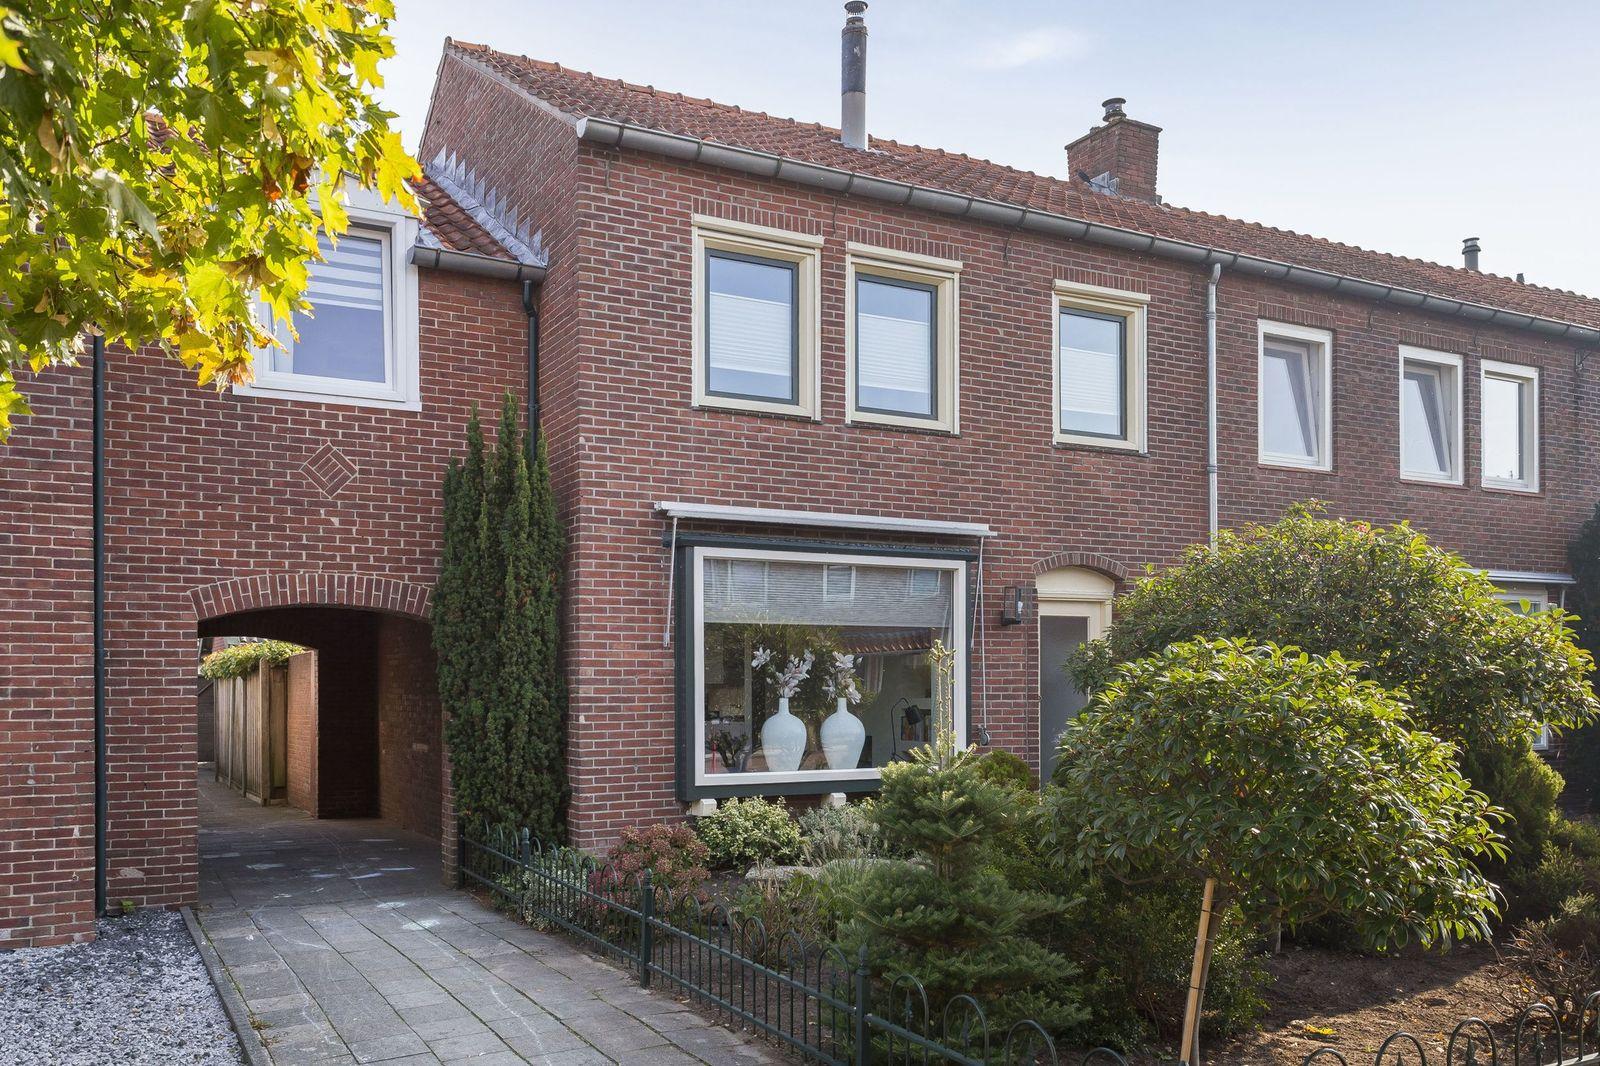 Zonnebloemstraat 36, Nijverdal